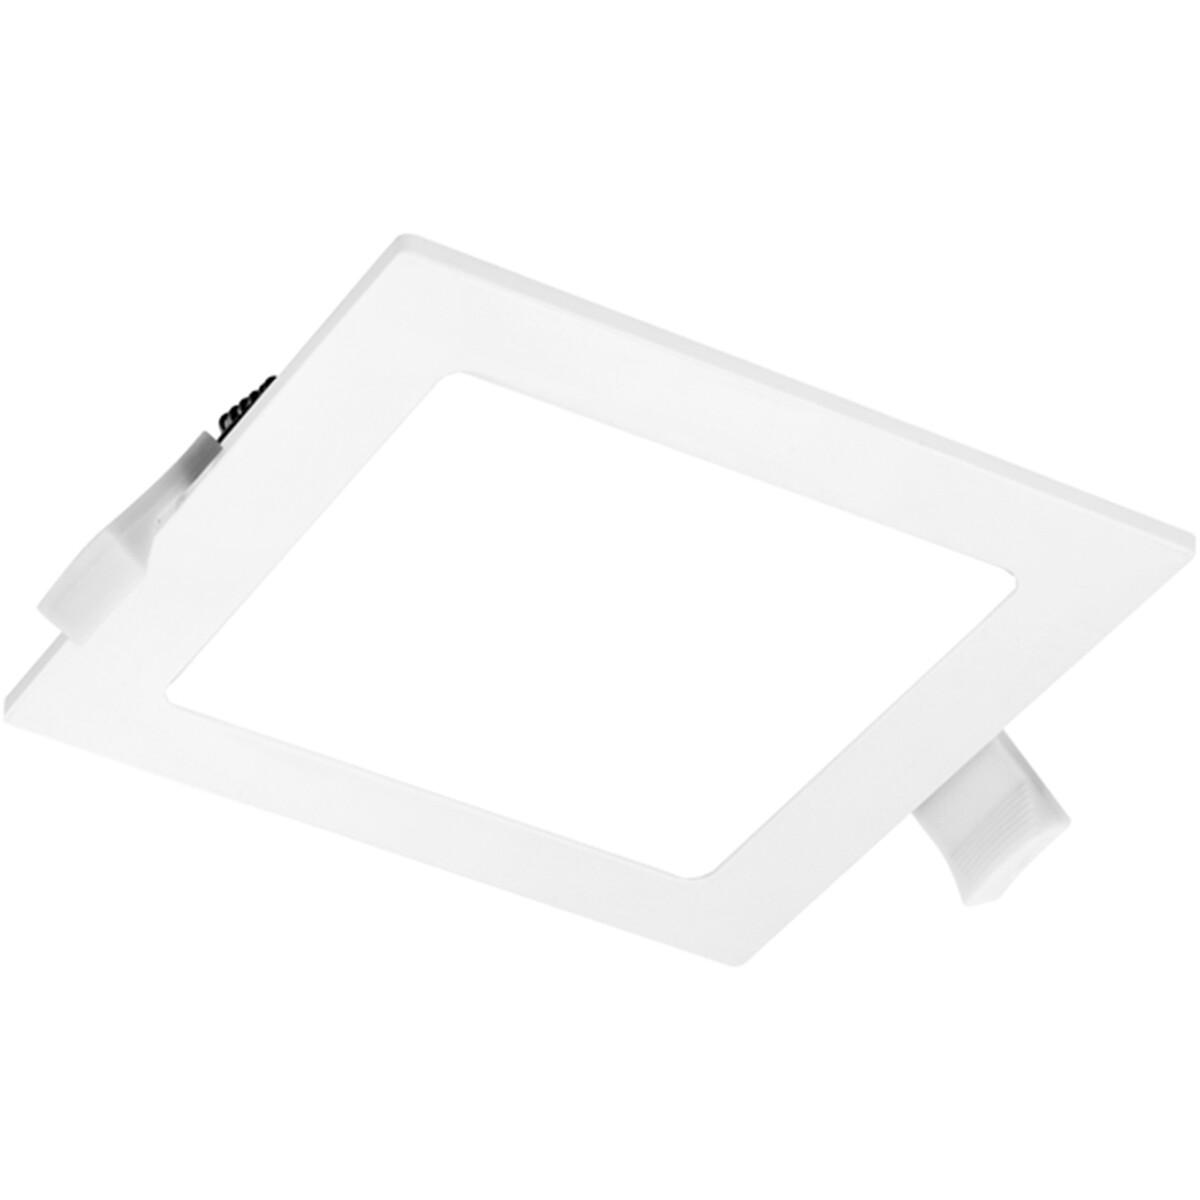 LED Downlight Slim Pro - Aigi Suno - Inbouw Vierkant 18W - Helder/Koud Wit 6000K - Mat Wit - Kunstst